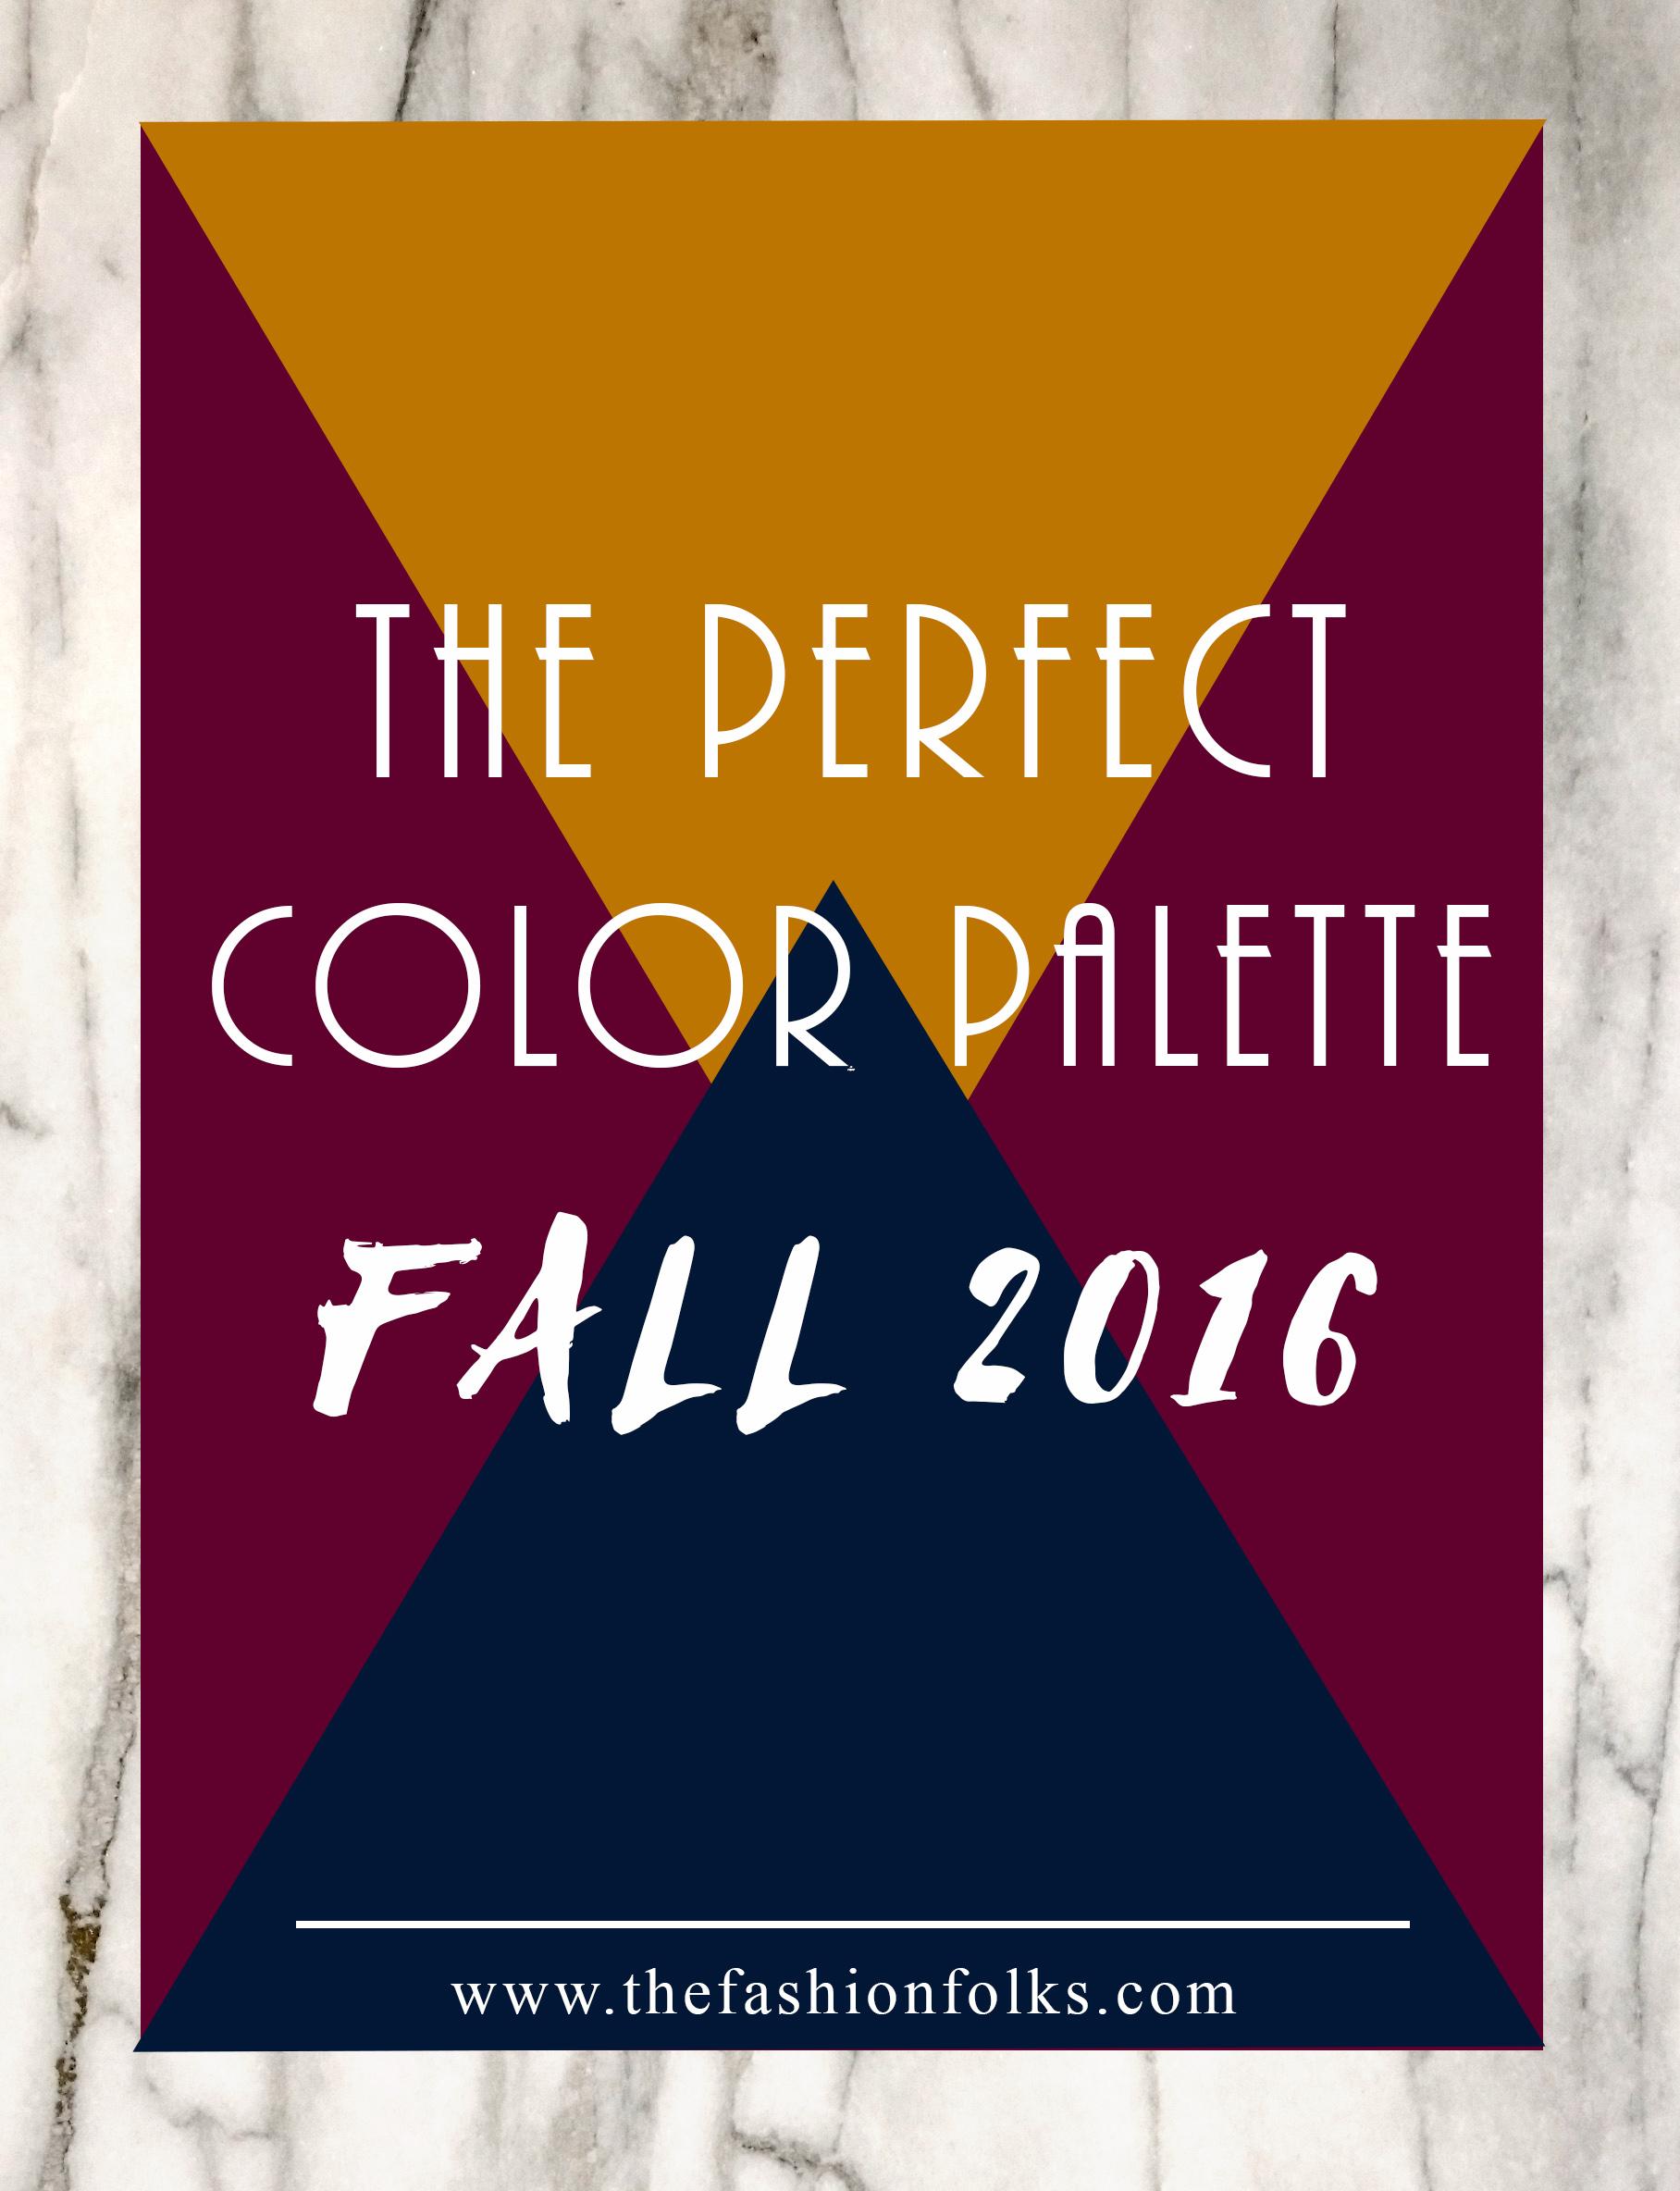 Fall Color Palette Fall 2016 | The Fashion Folks